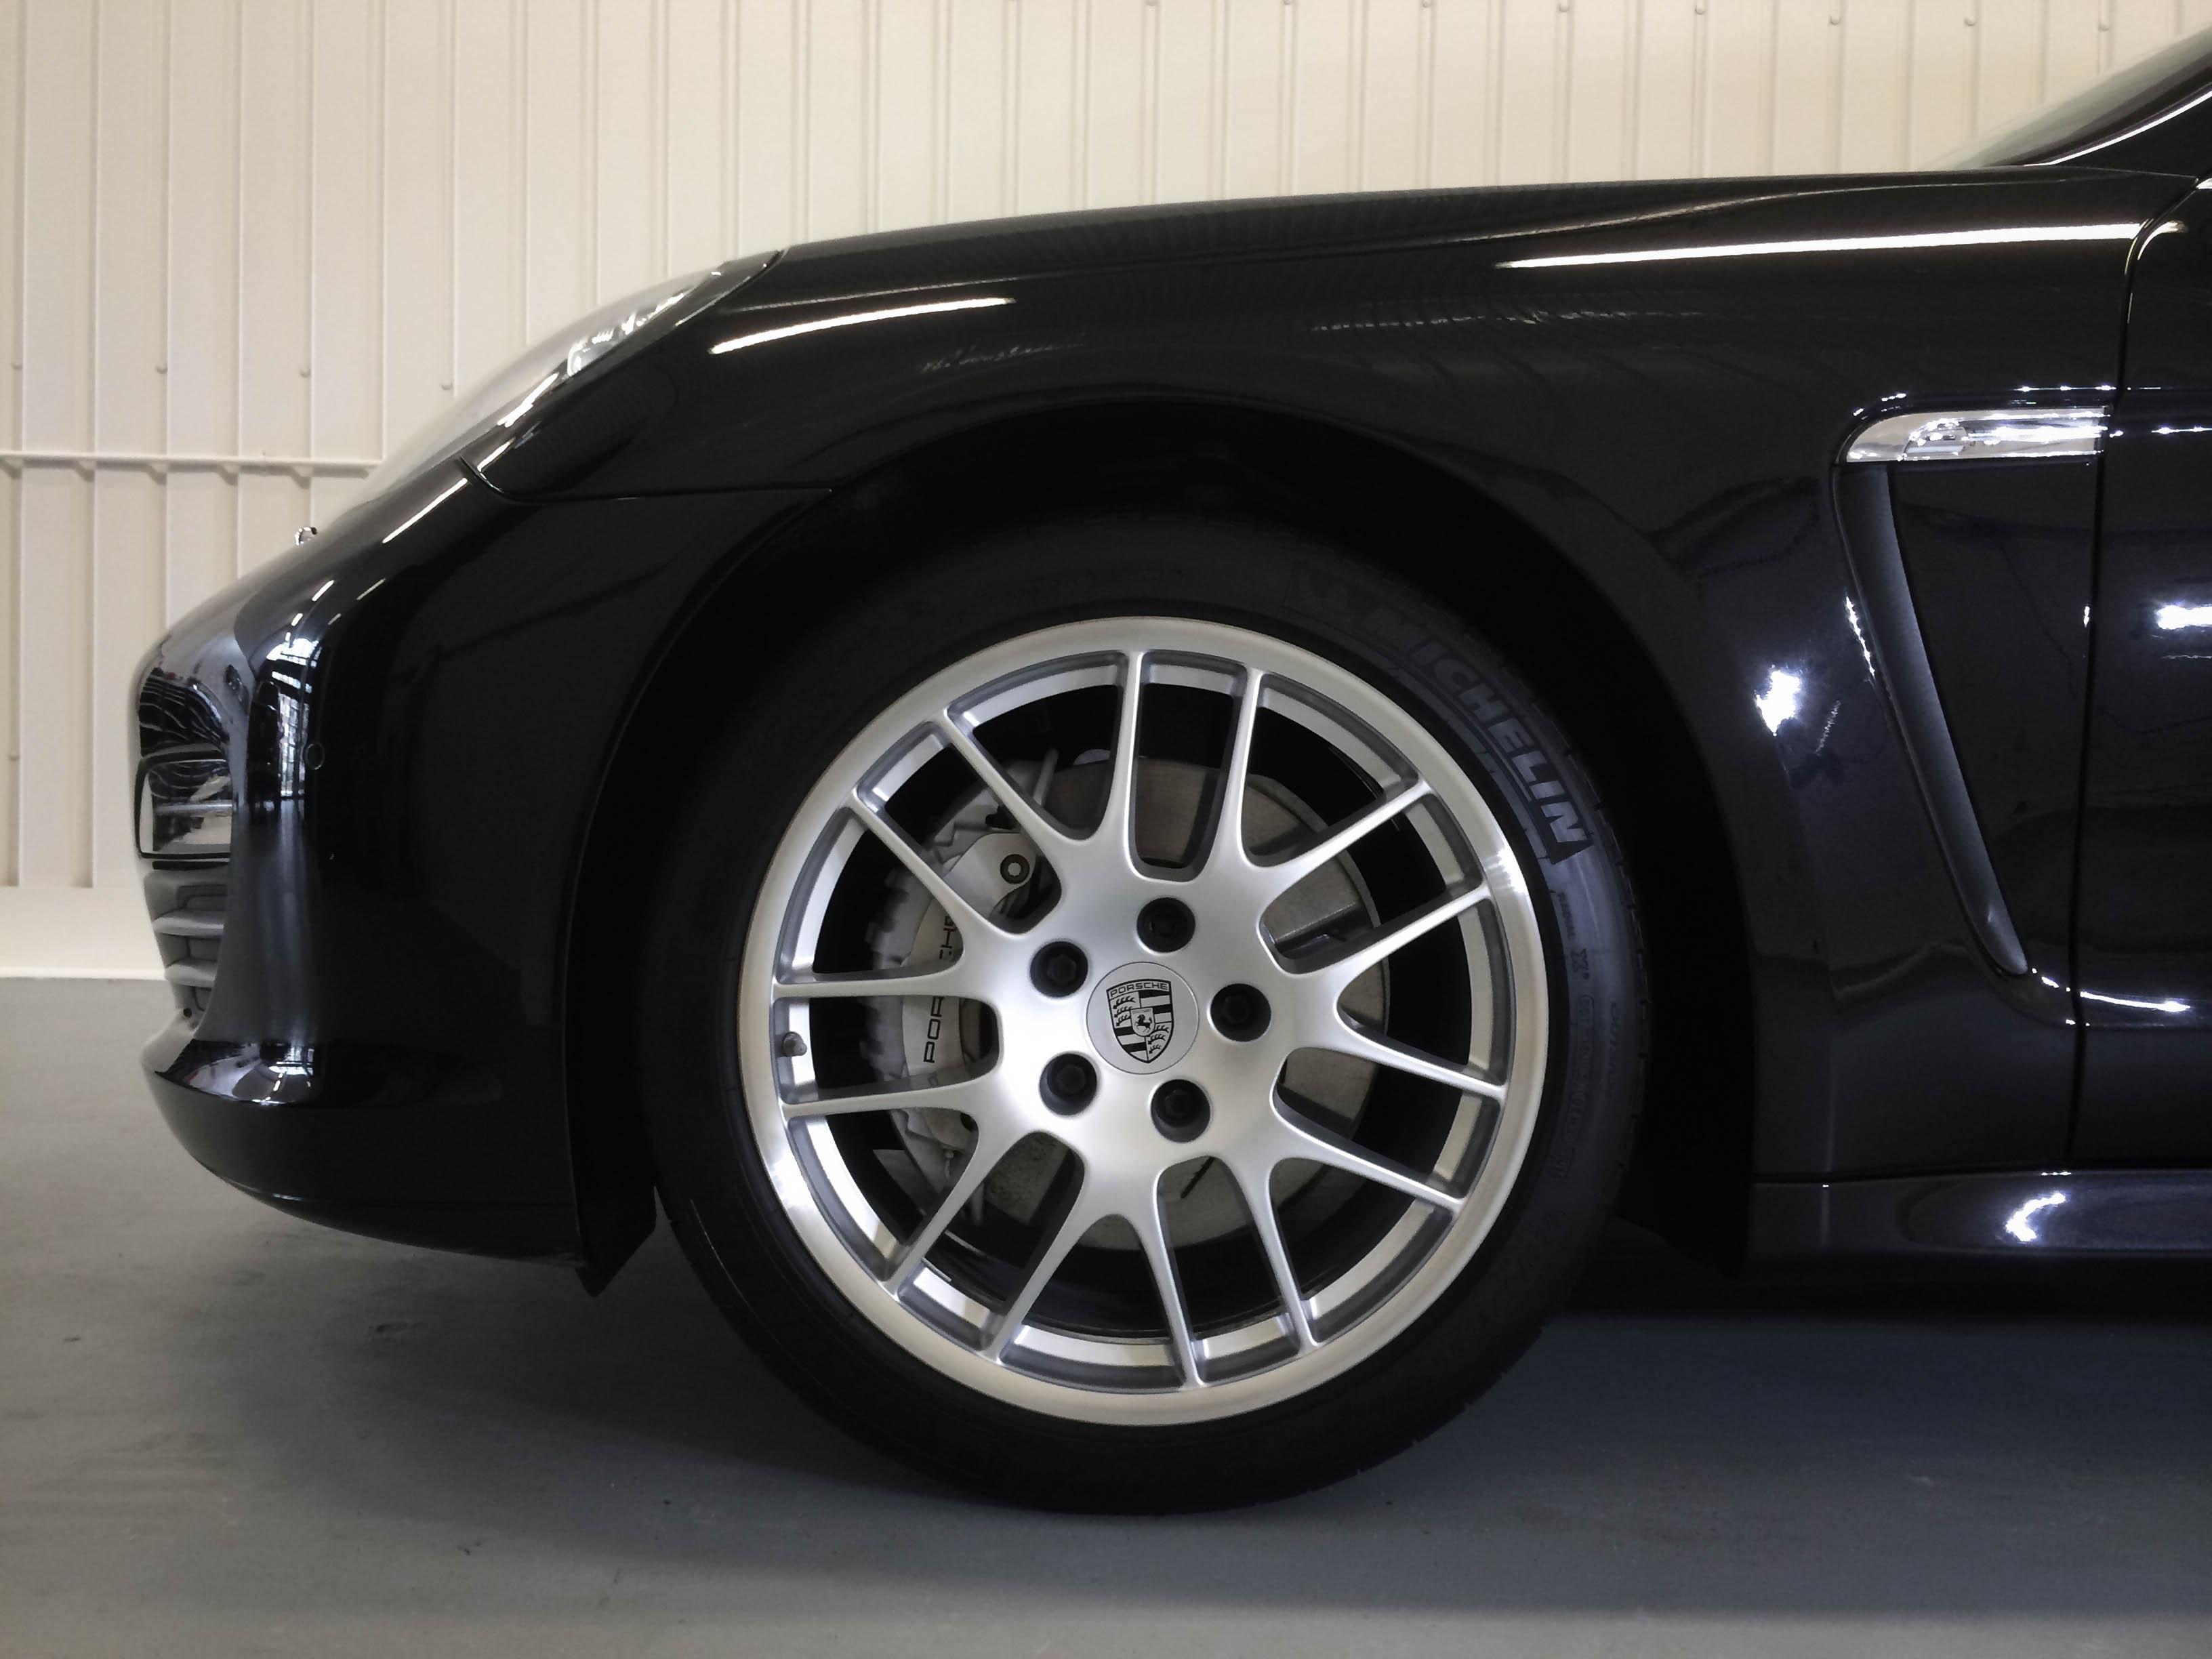 Porsche Panamera –Wheel detail